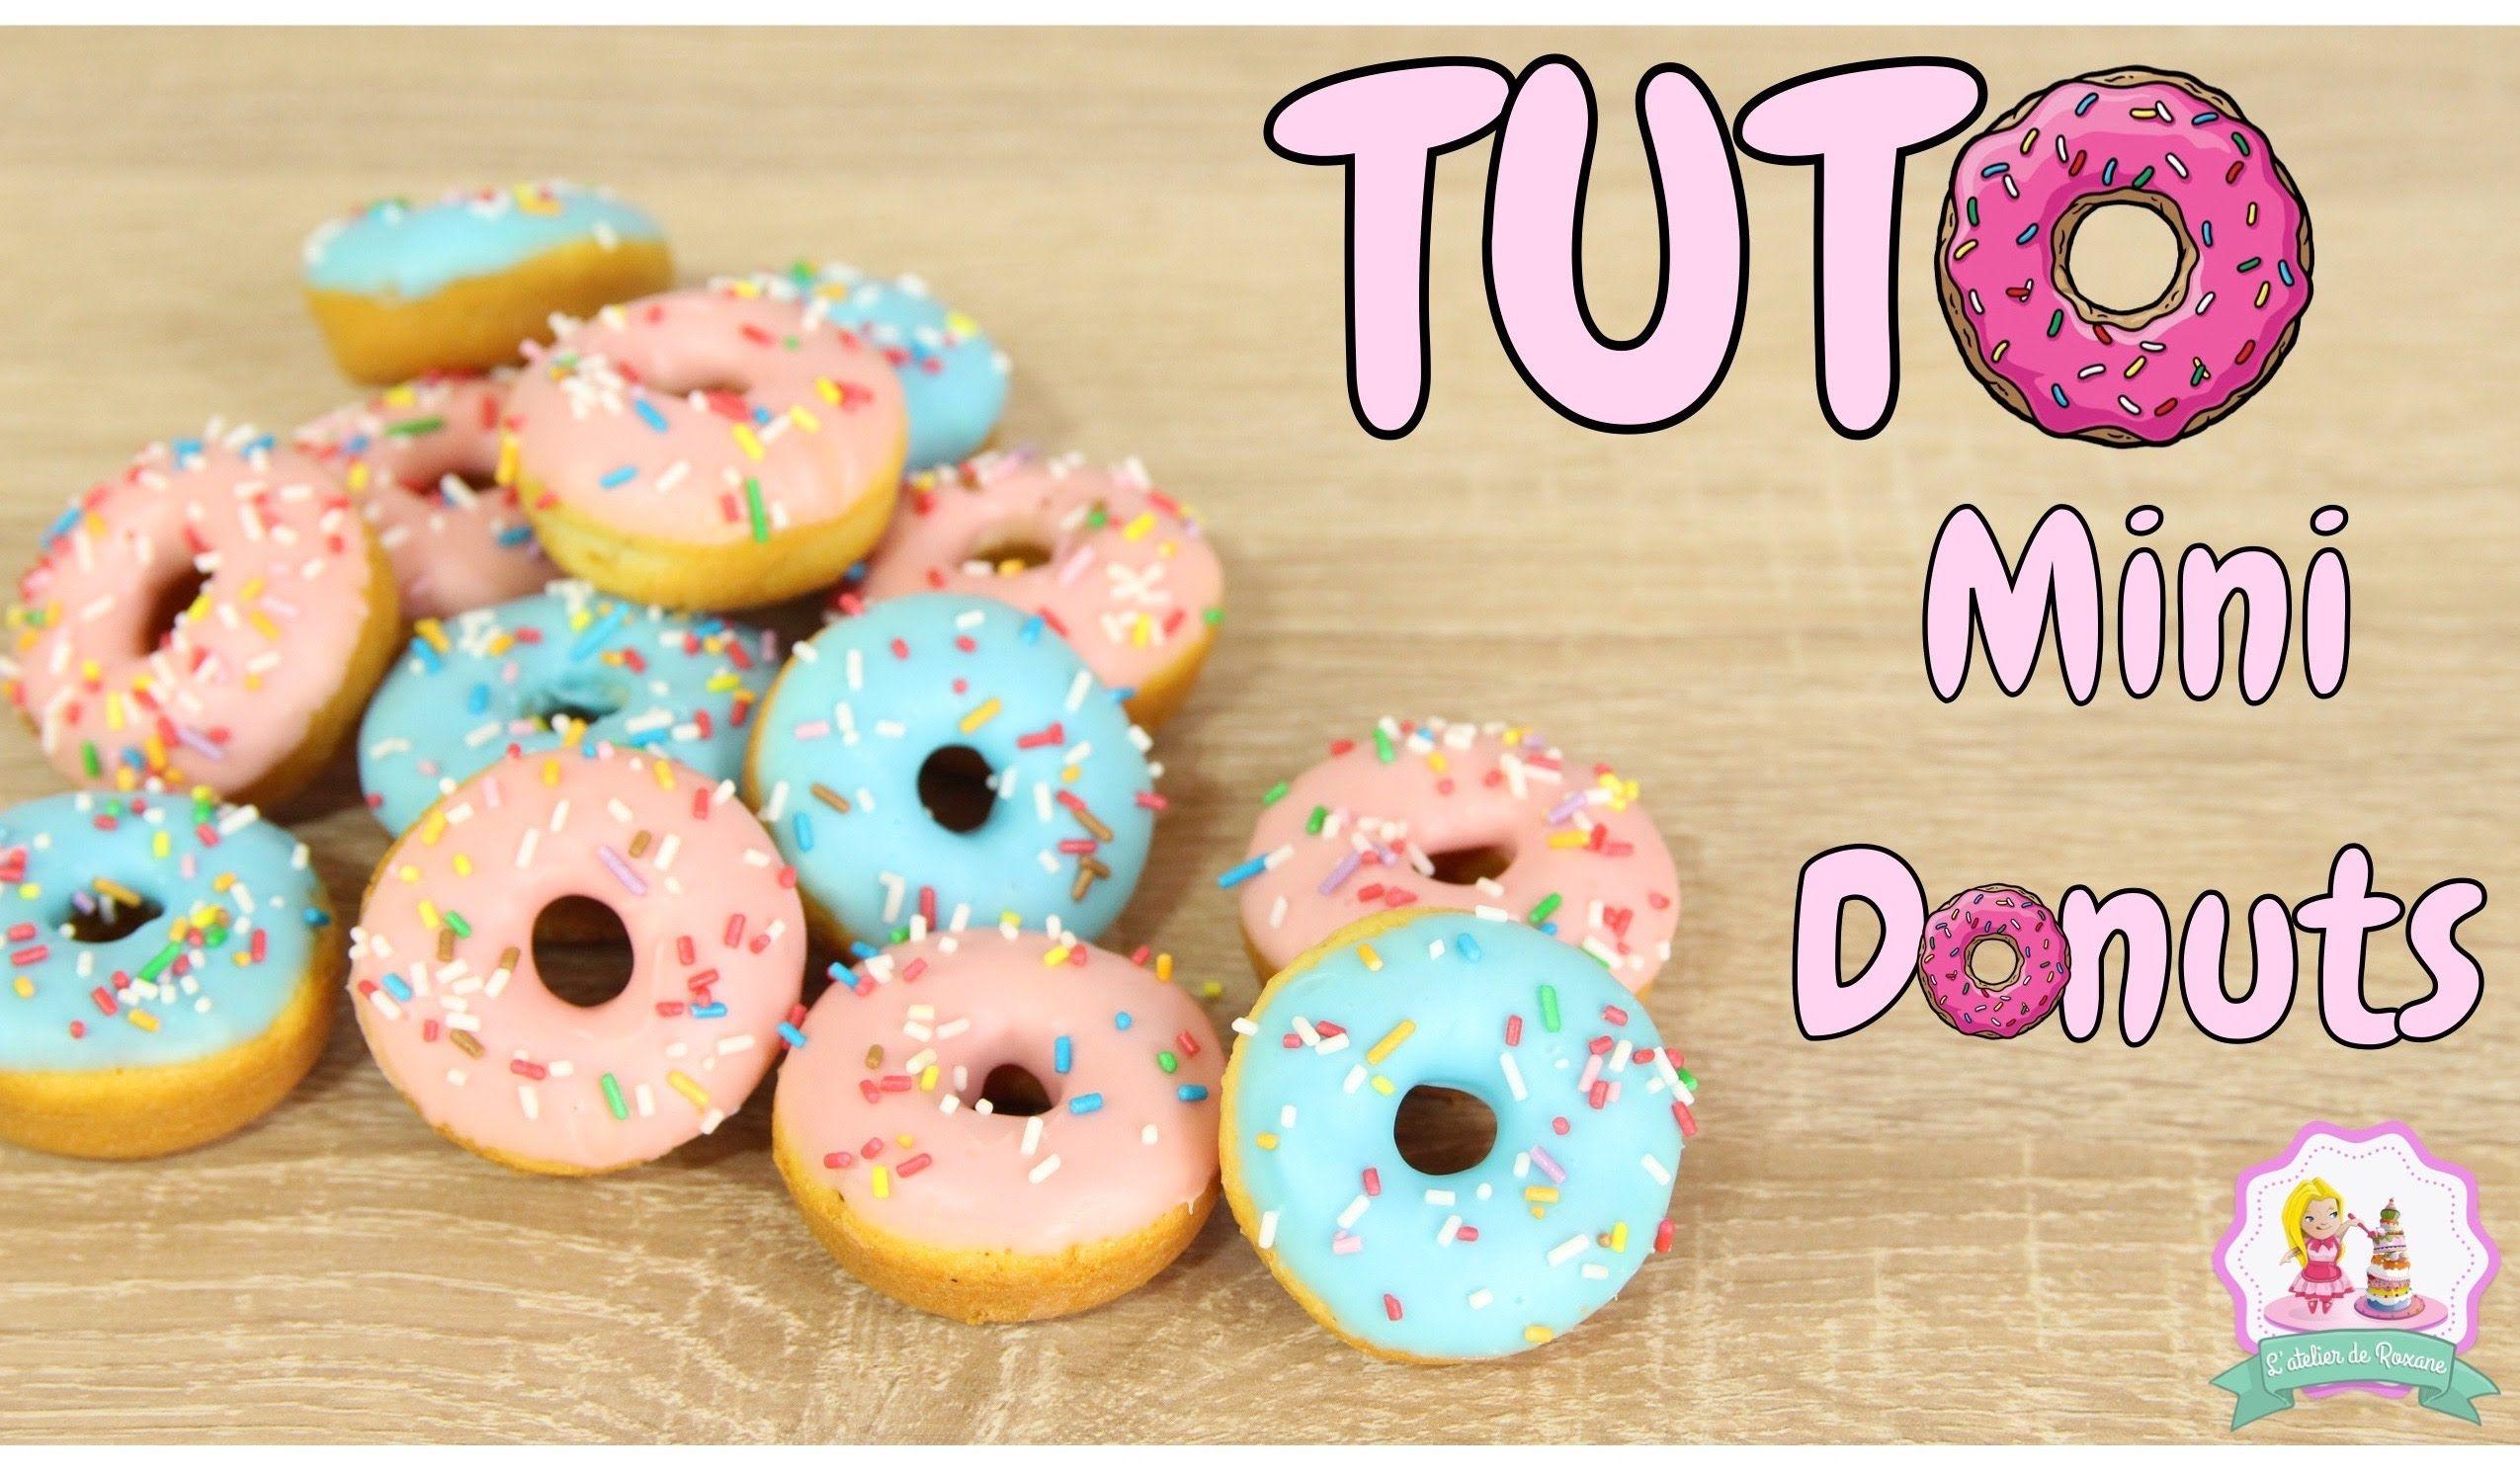 mini donuts recette donuts rapide et facile donuts. Black Bedroom Furniture Sets. Home Design Ideas